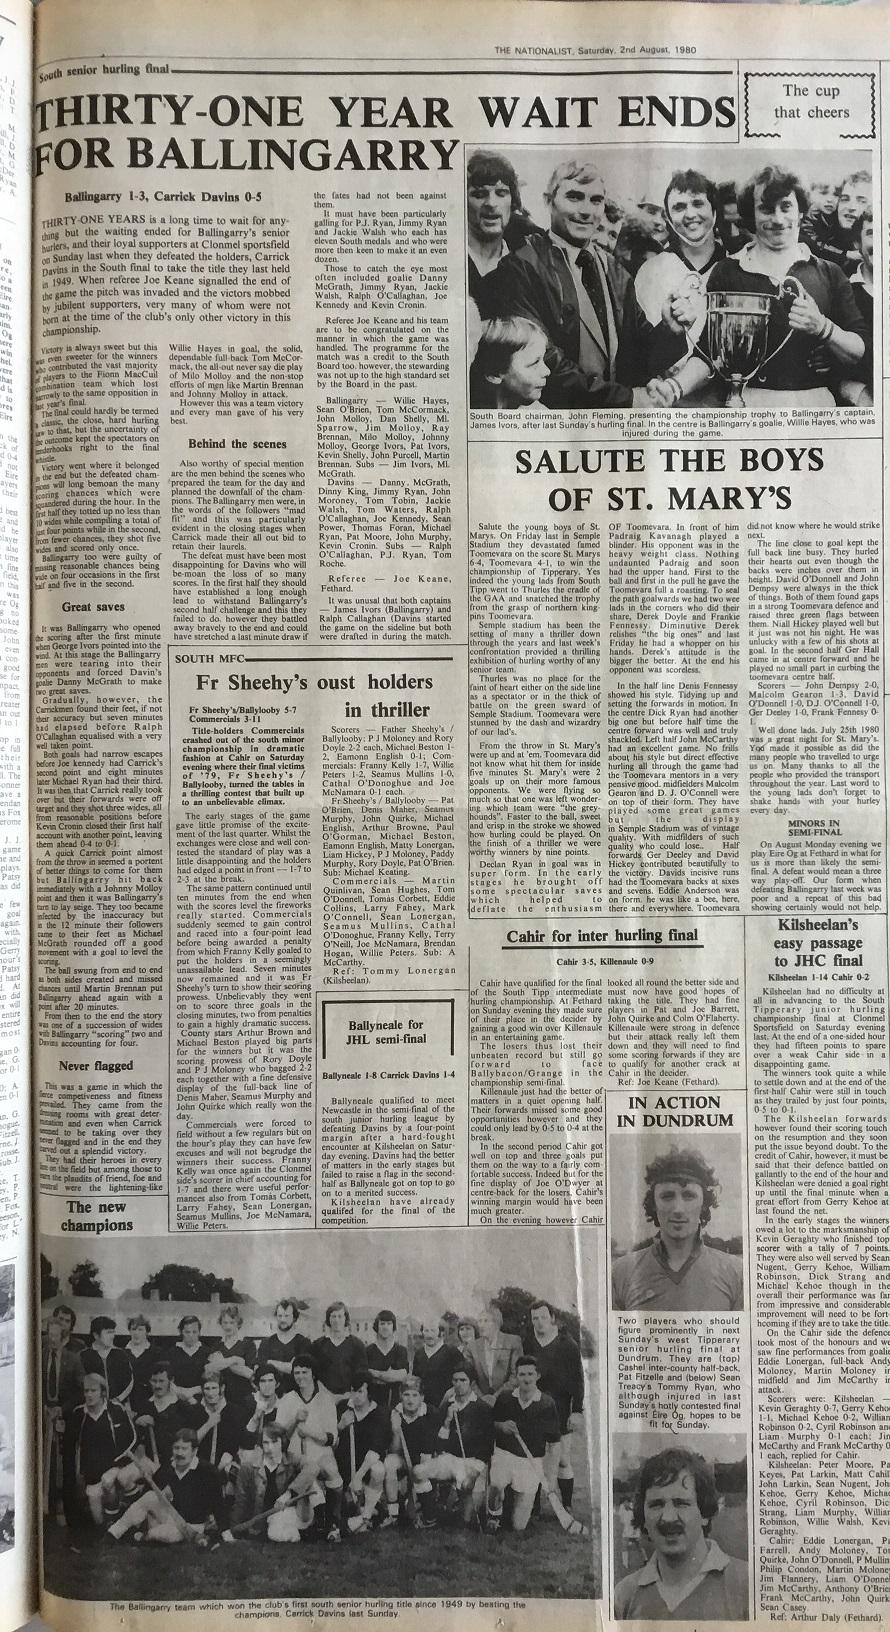 1980 South hurling final